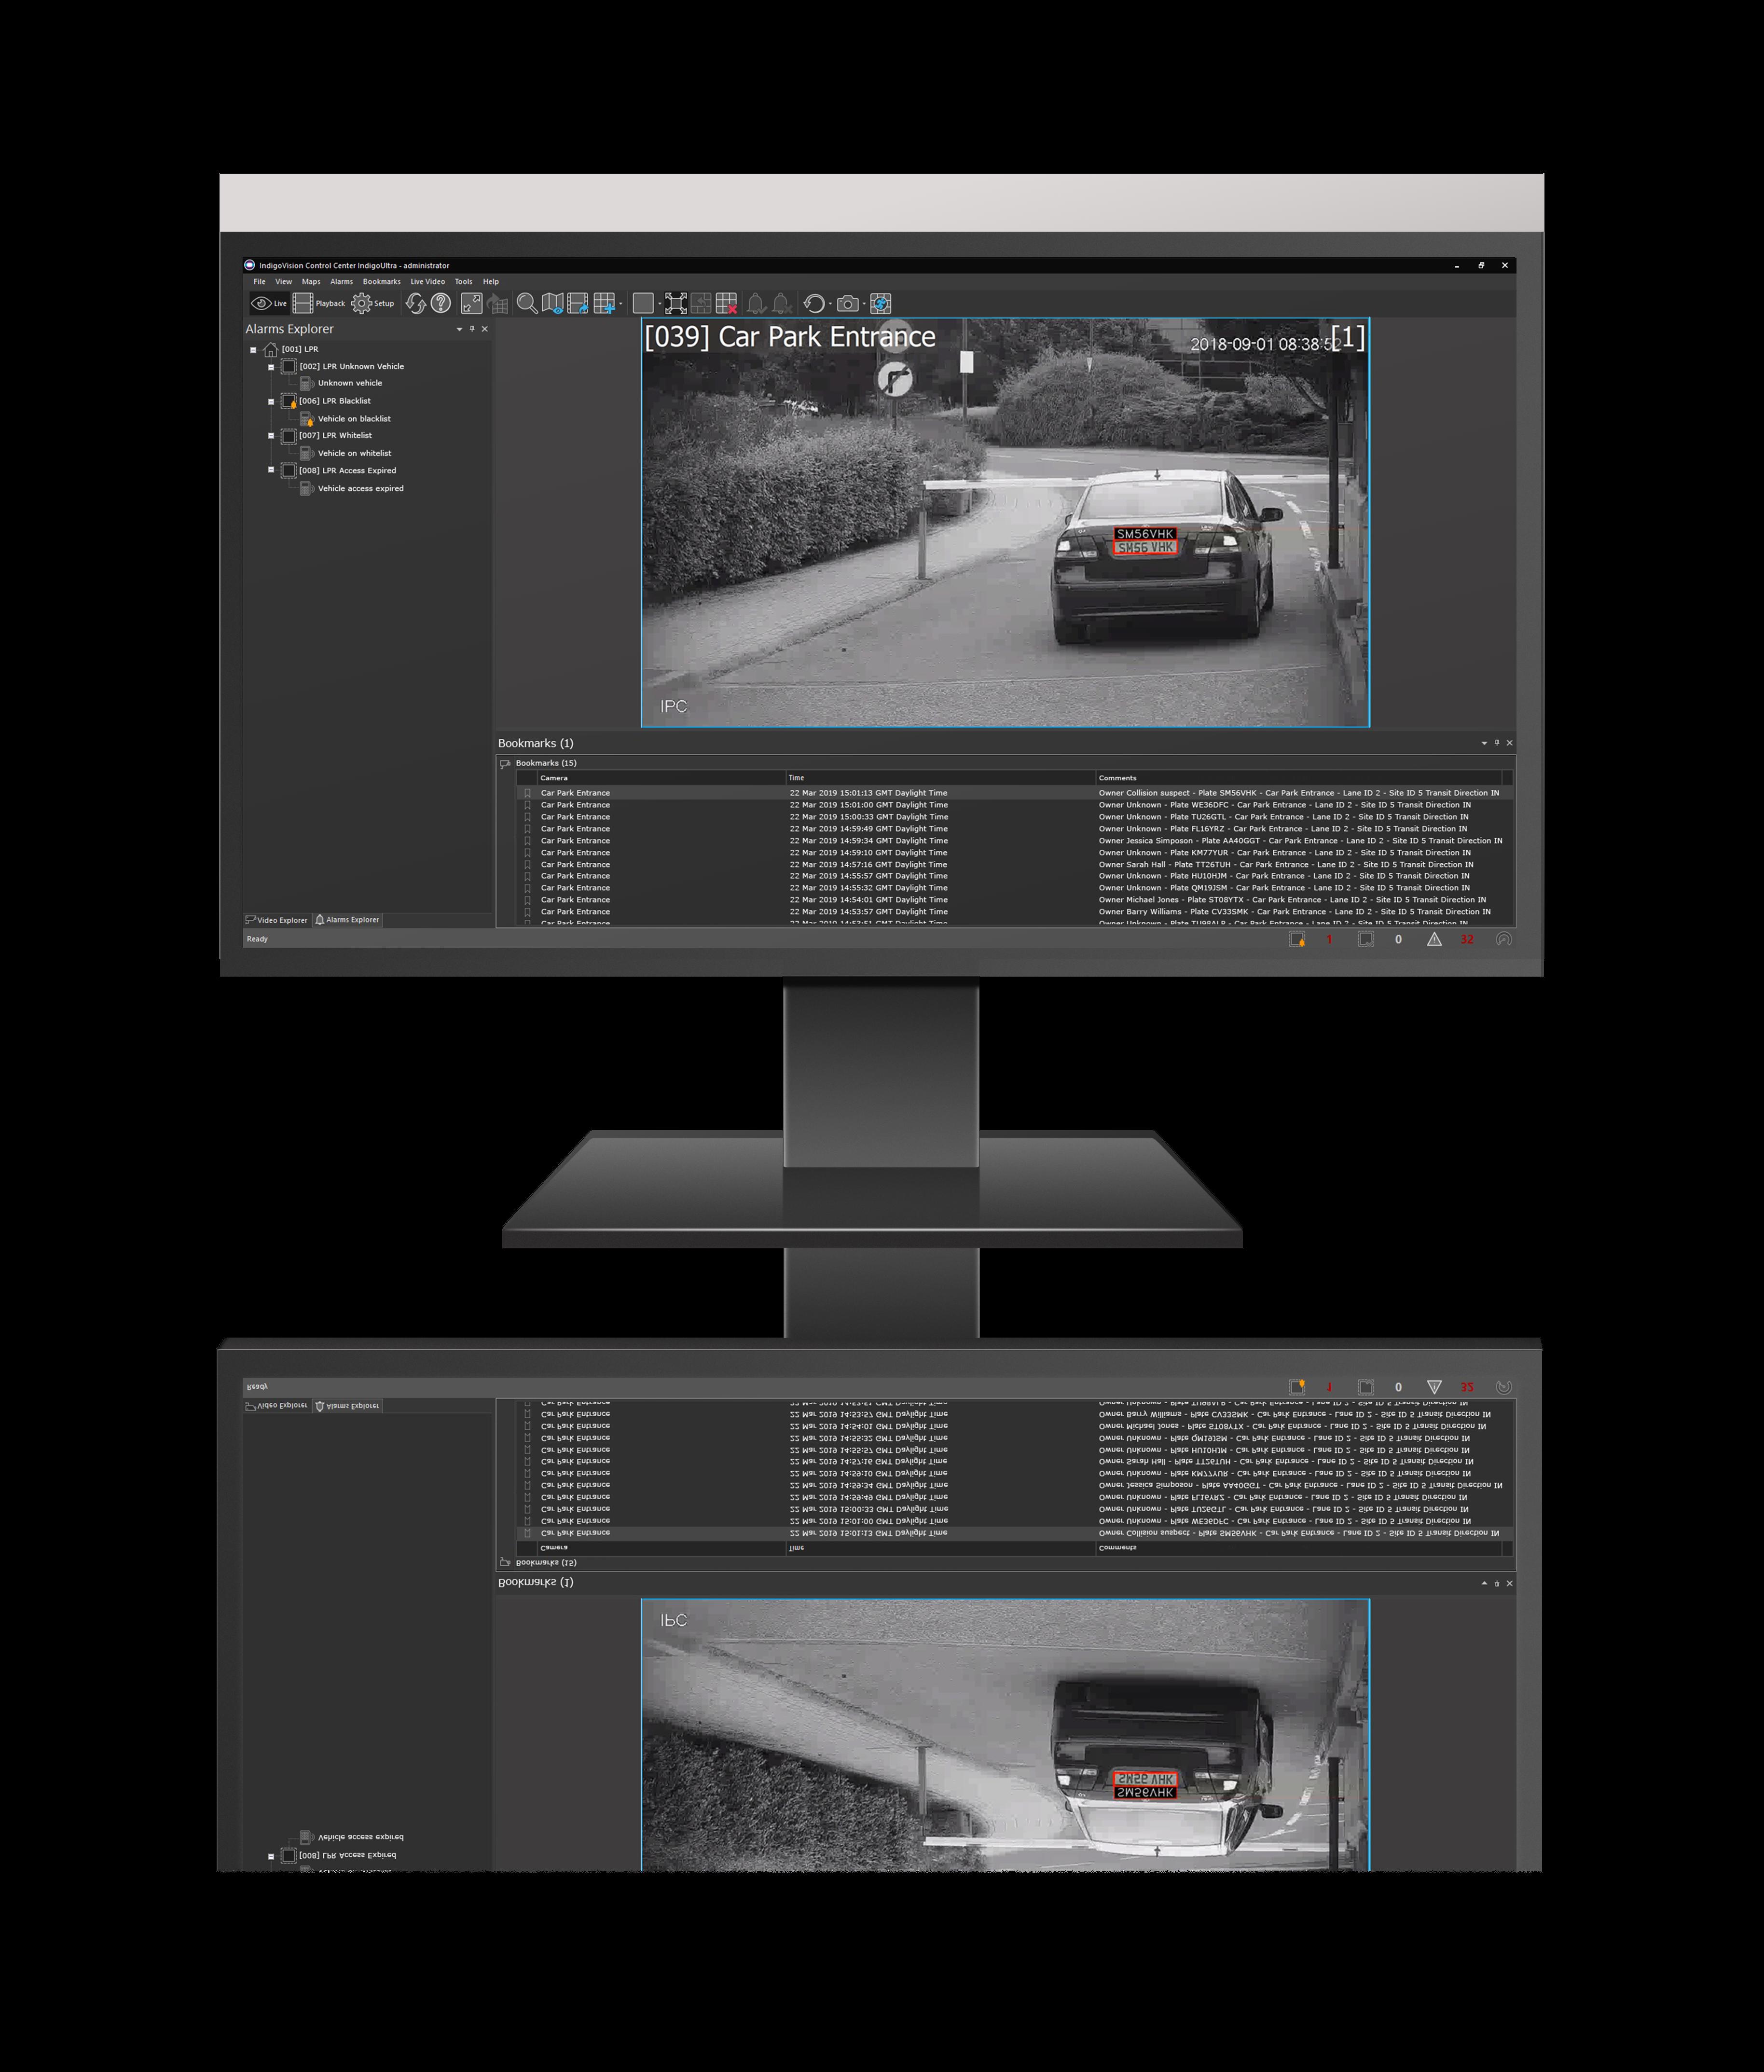 IndigoVision LPR powered by InnoWare_reflection